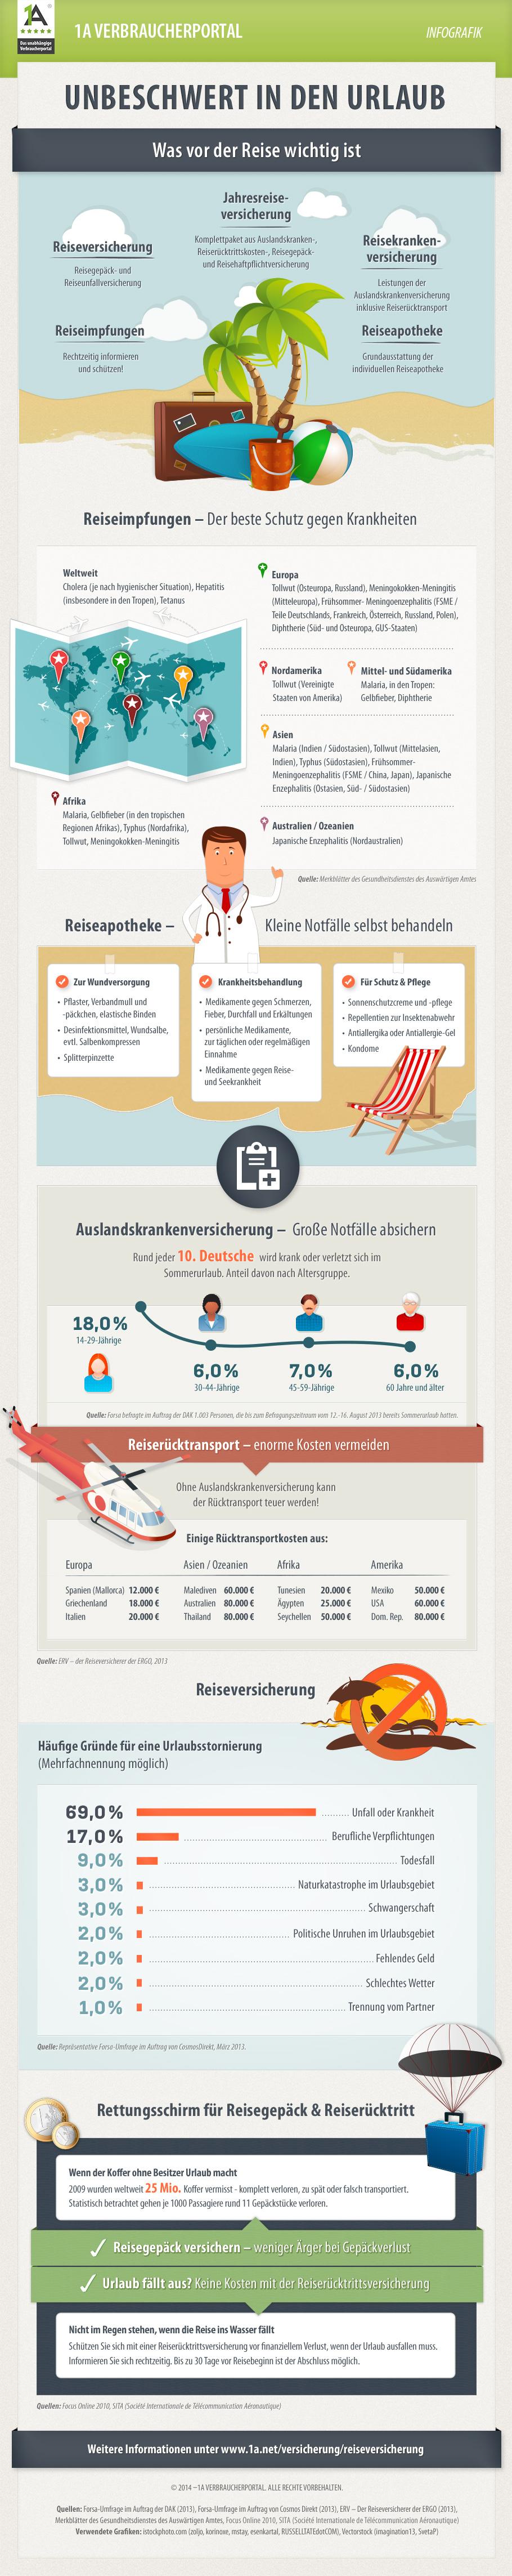 reiseversicherung-infografik